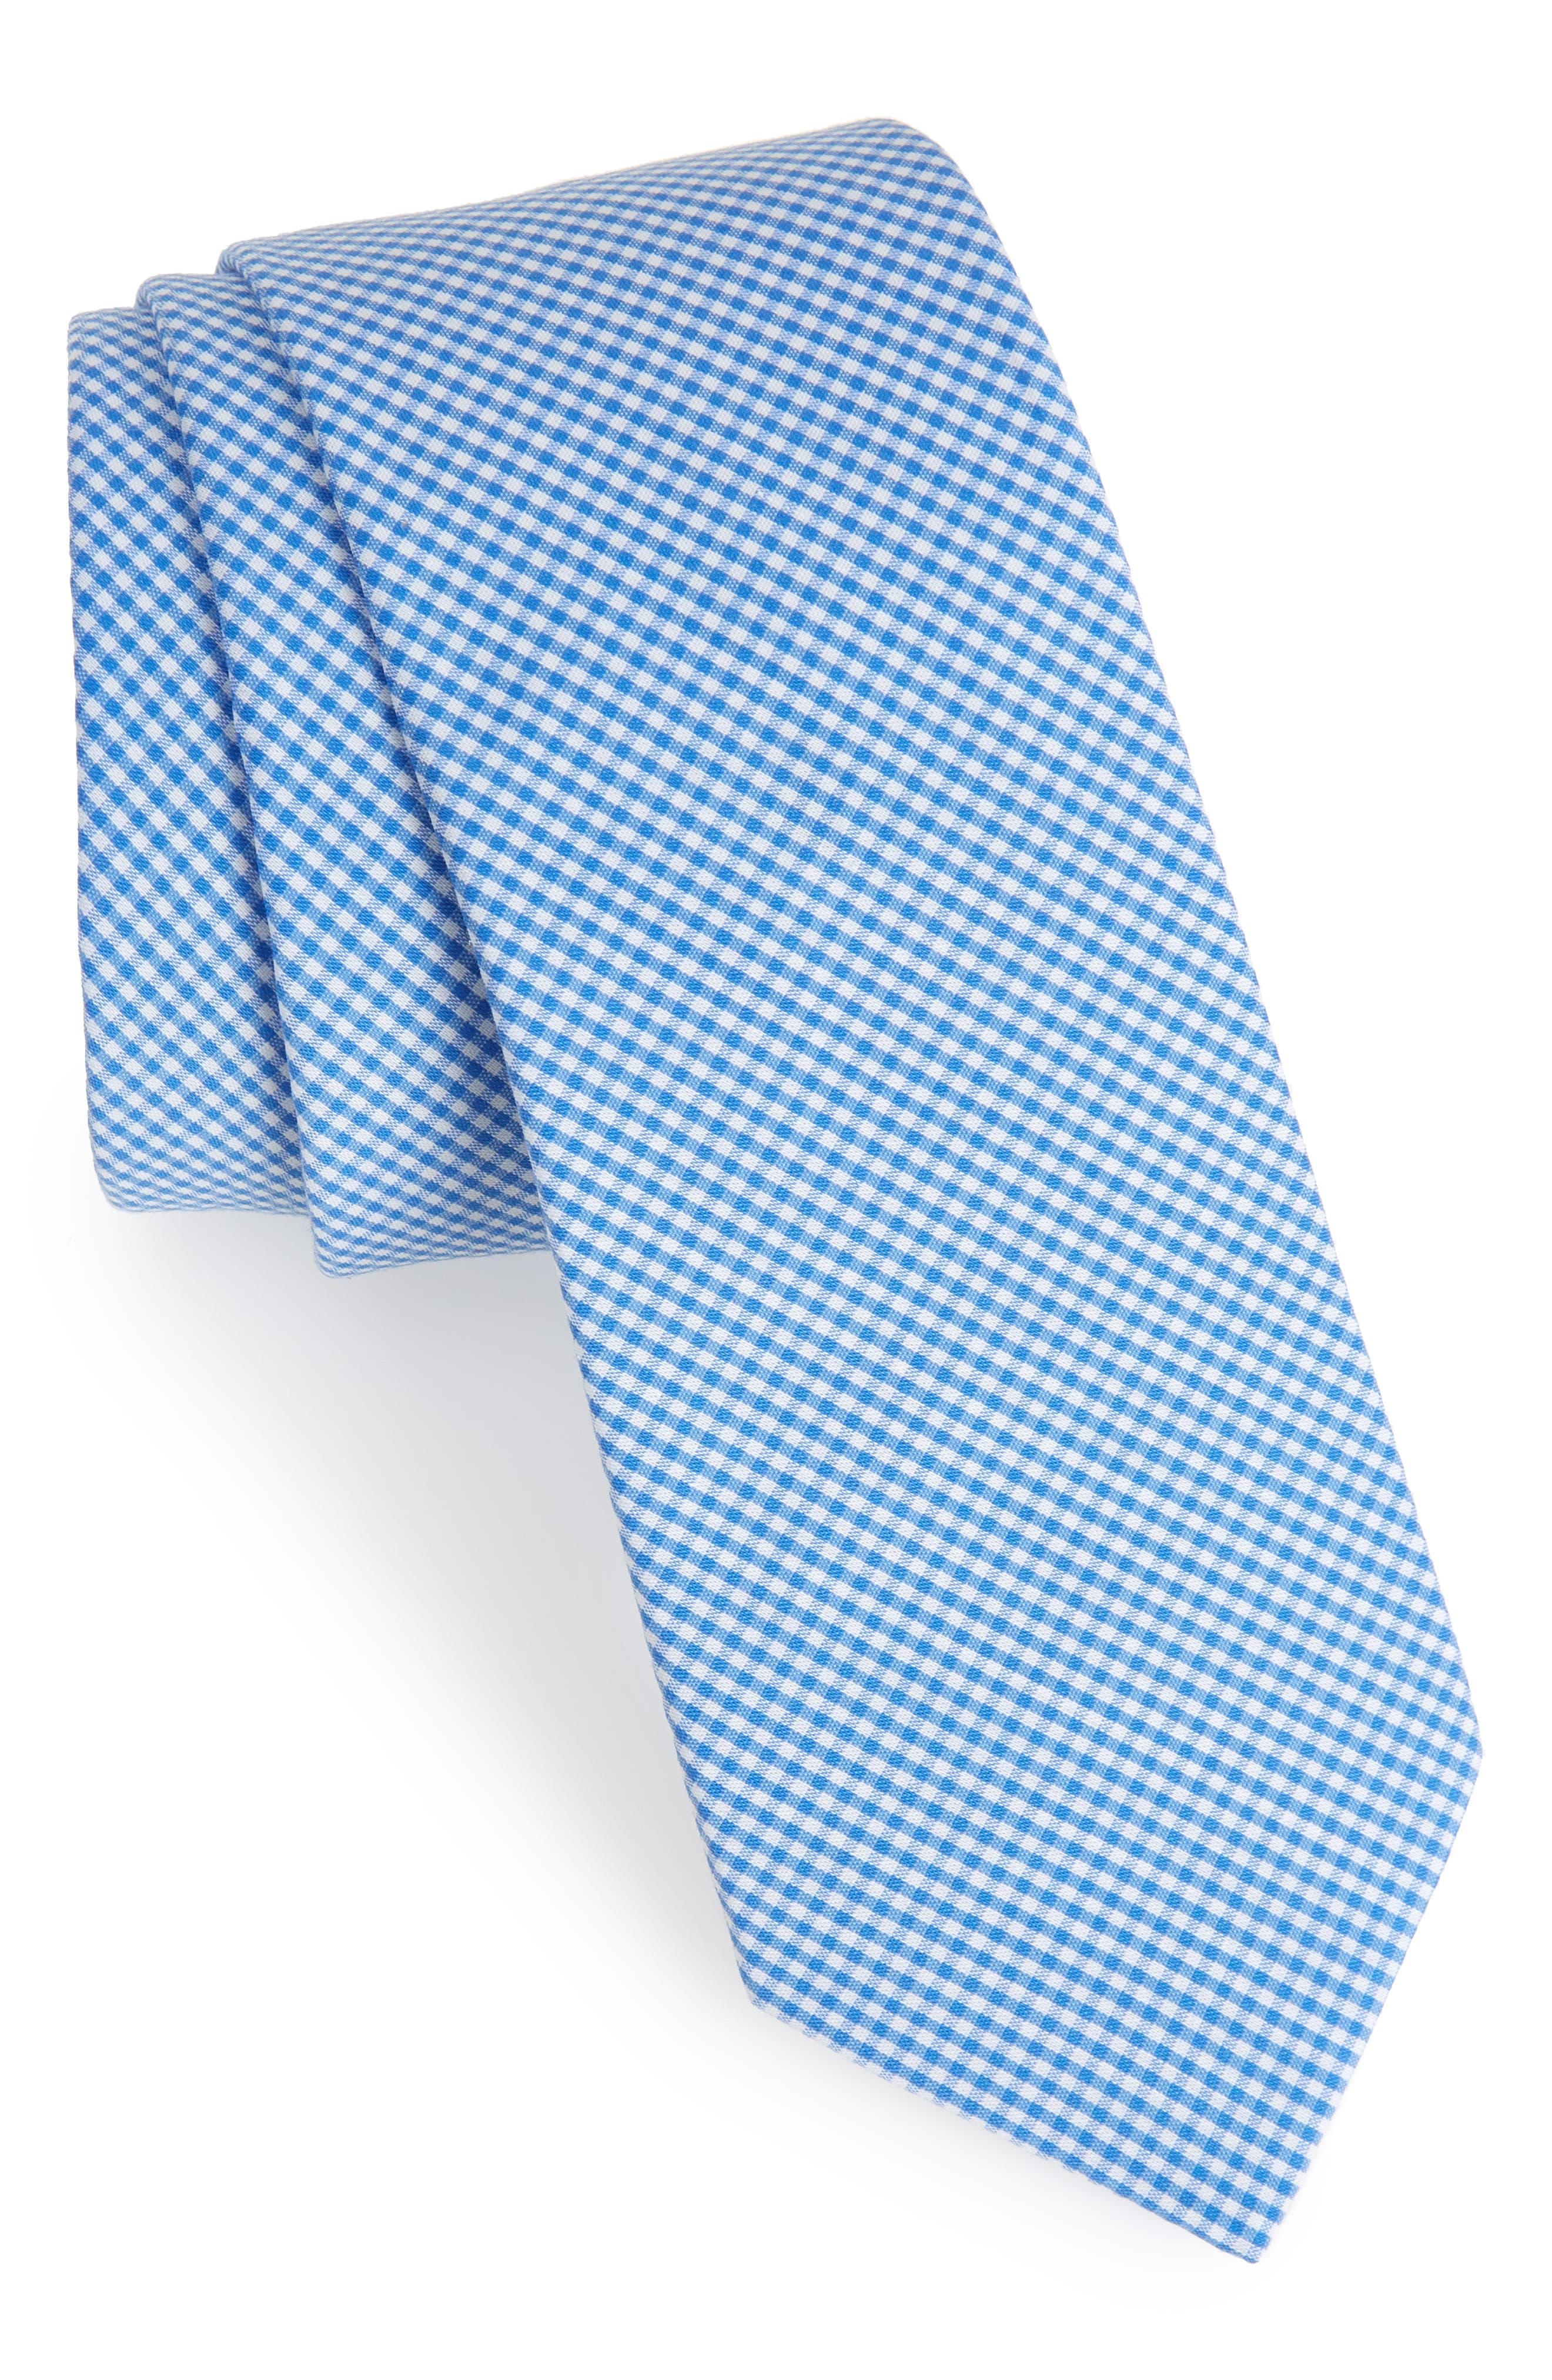 Sydney Check Cotton Skinny Tie,                         Main,                         color, Light Blue